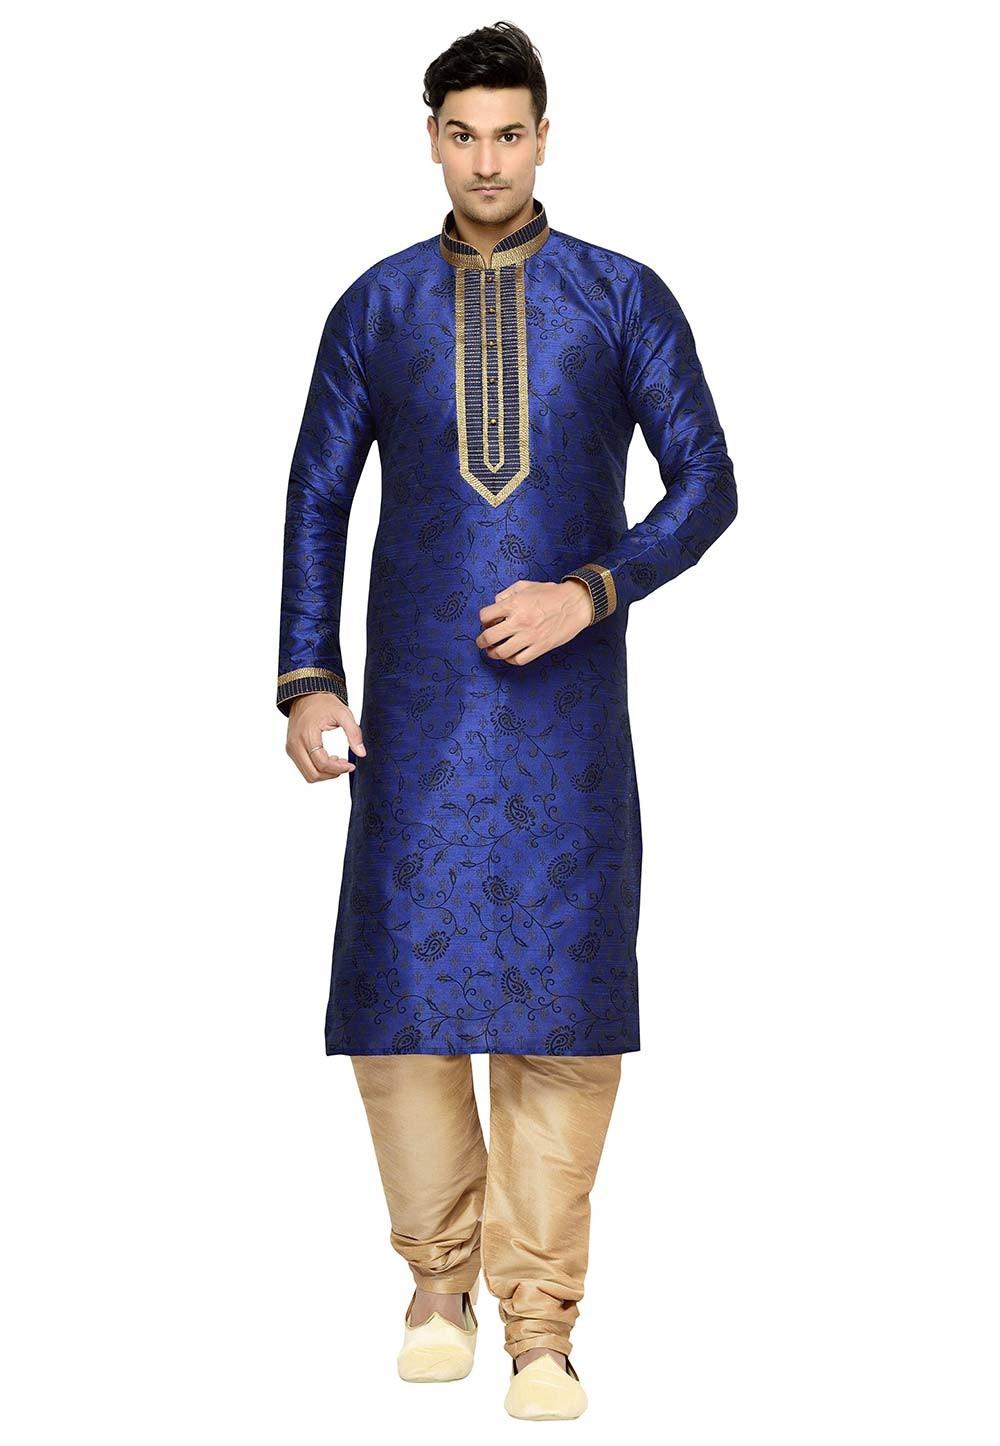 Blue Color Dupion Silk kurta Pyjama.